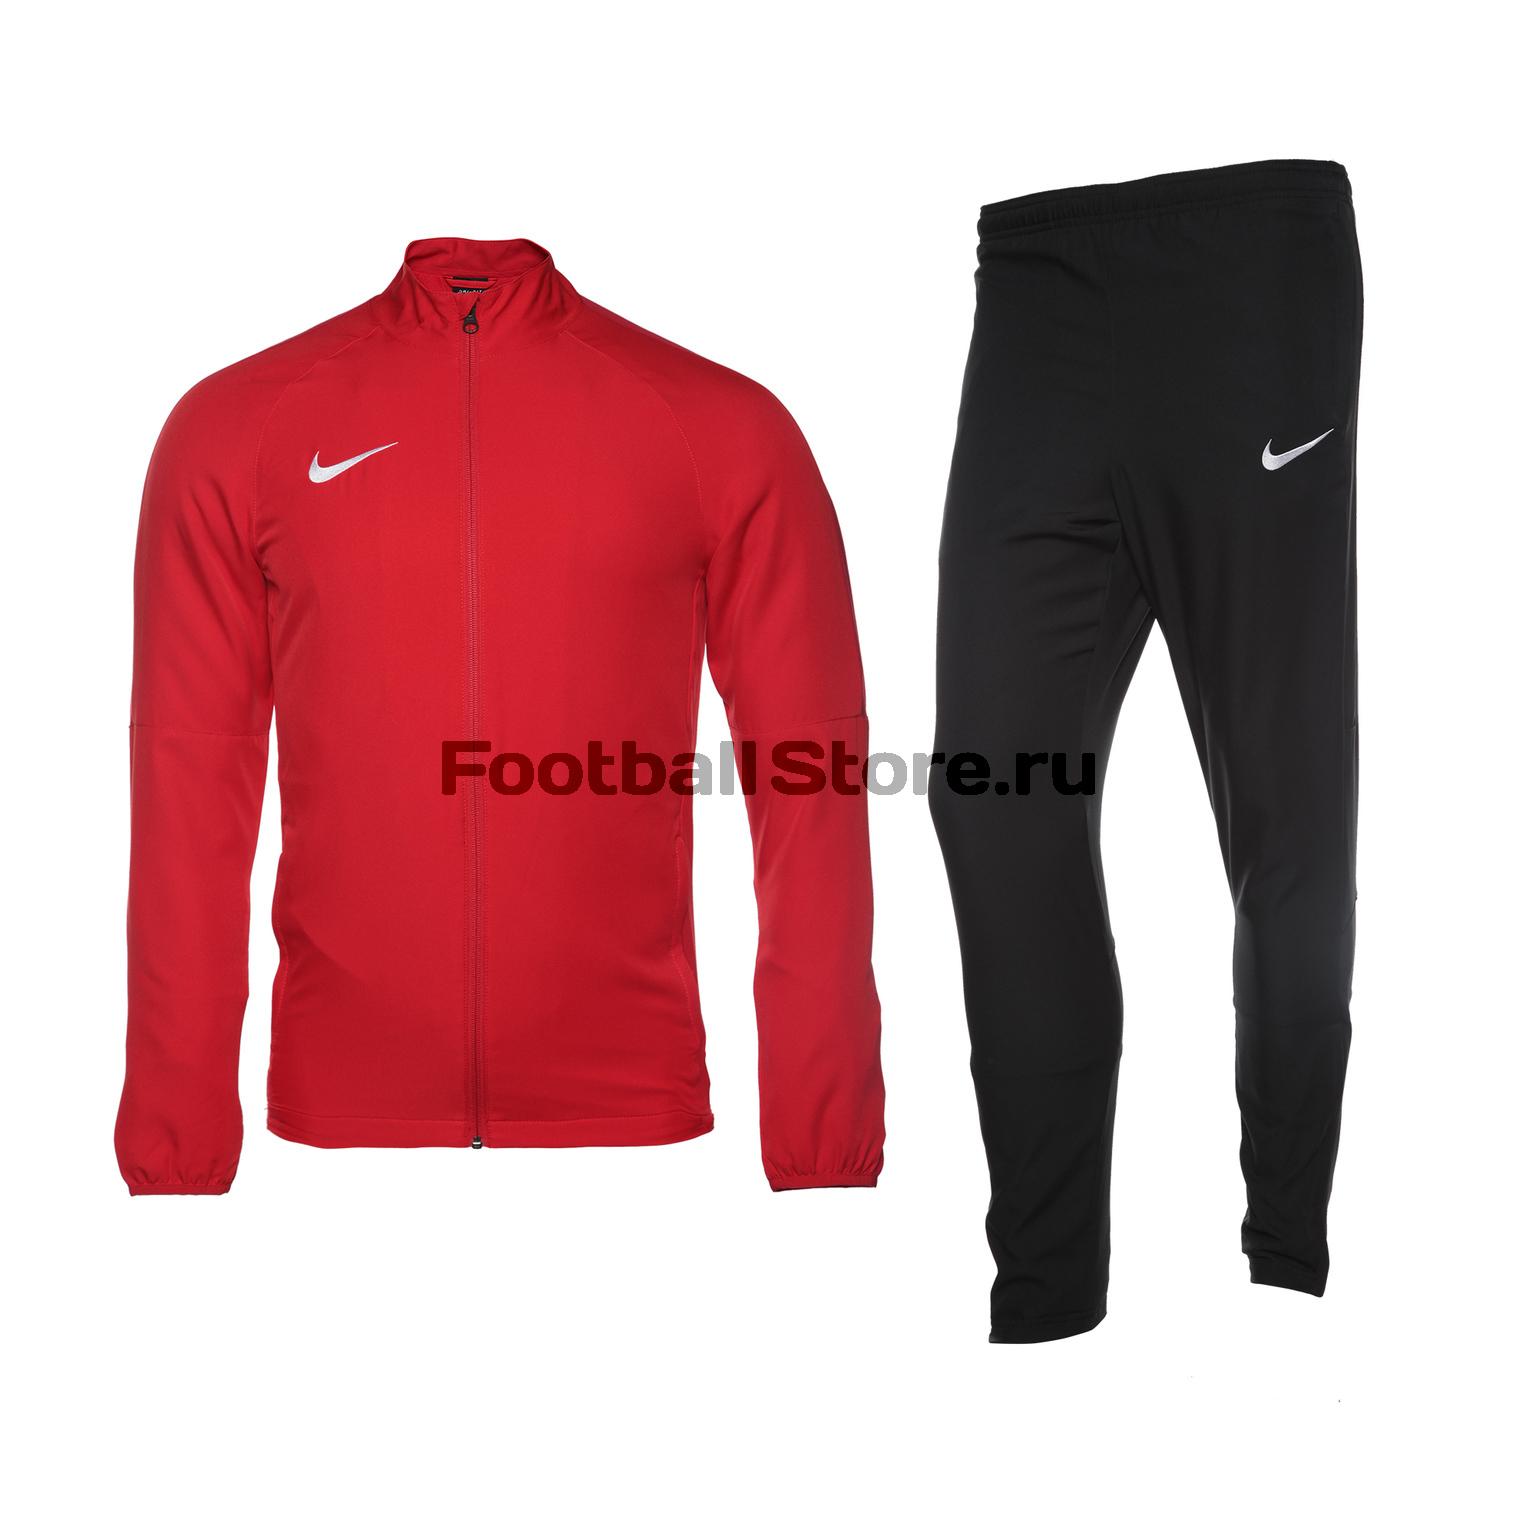 Костюм спортивный Nike Dry Academy18 TRK Suit W 893709-657